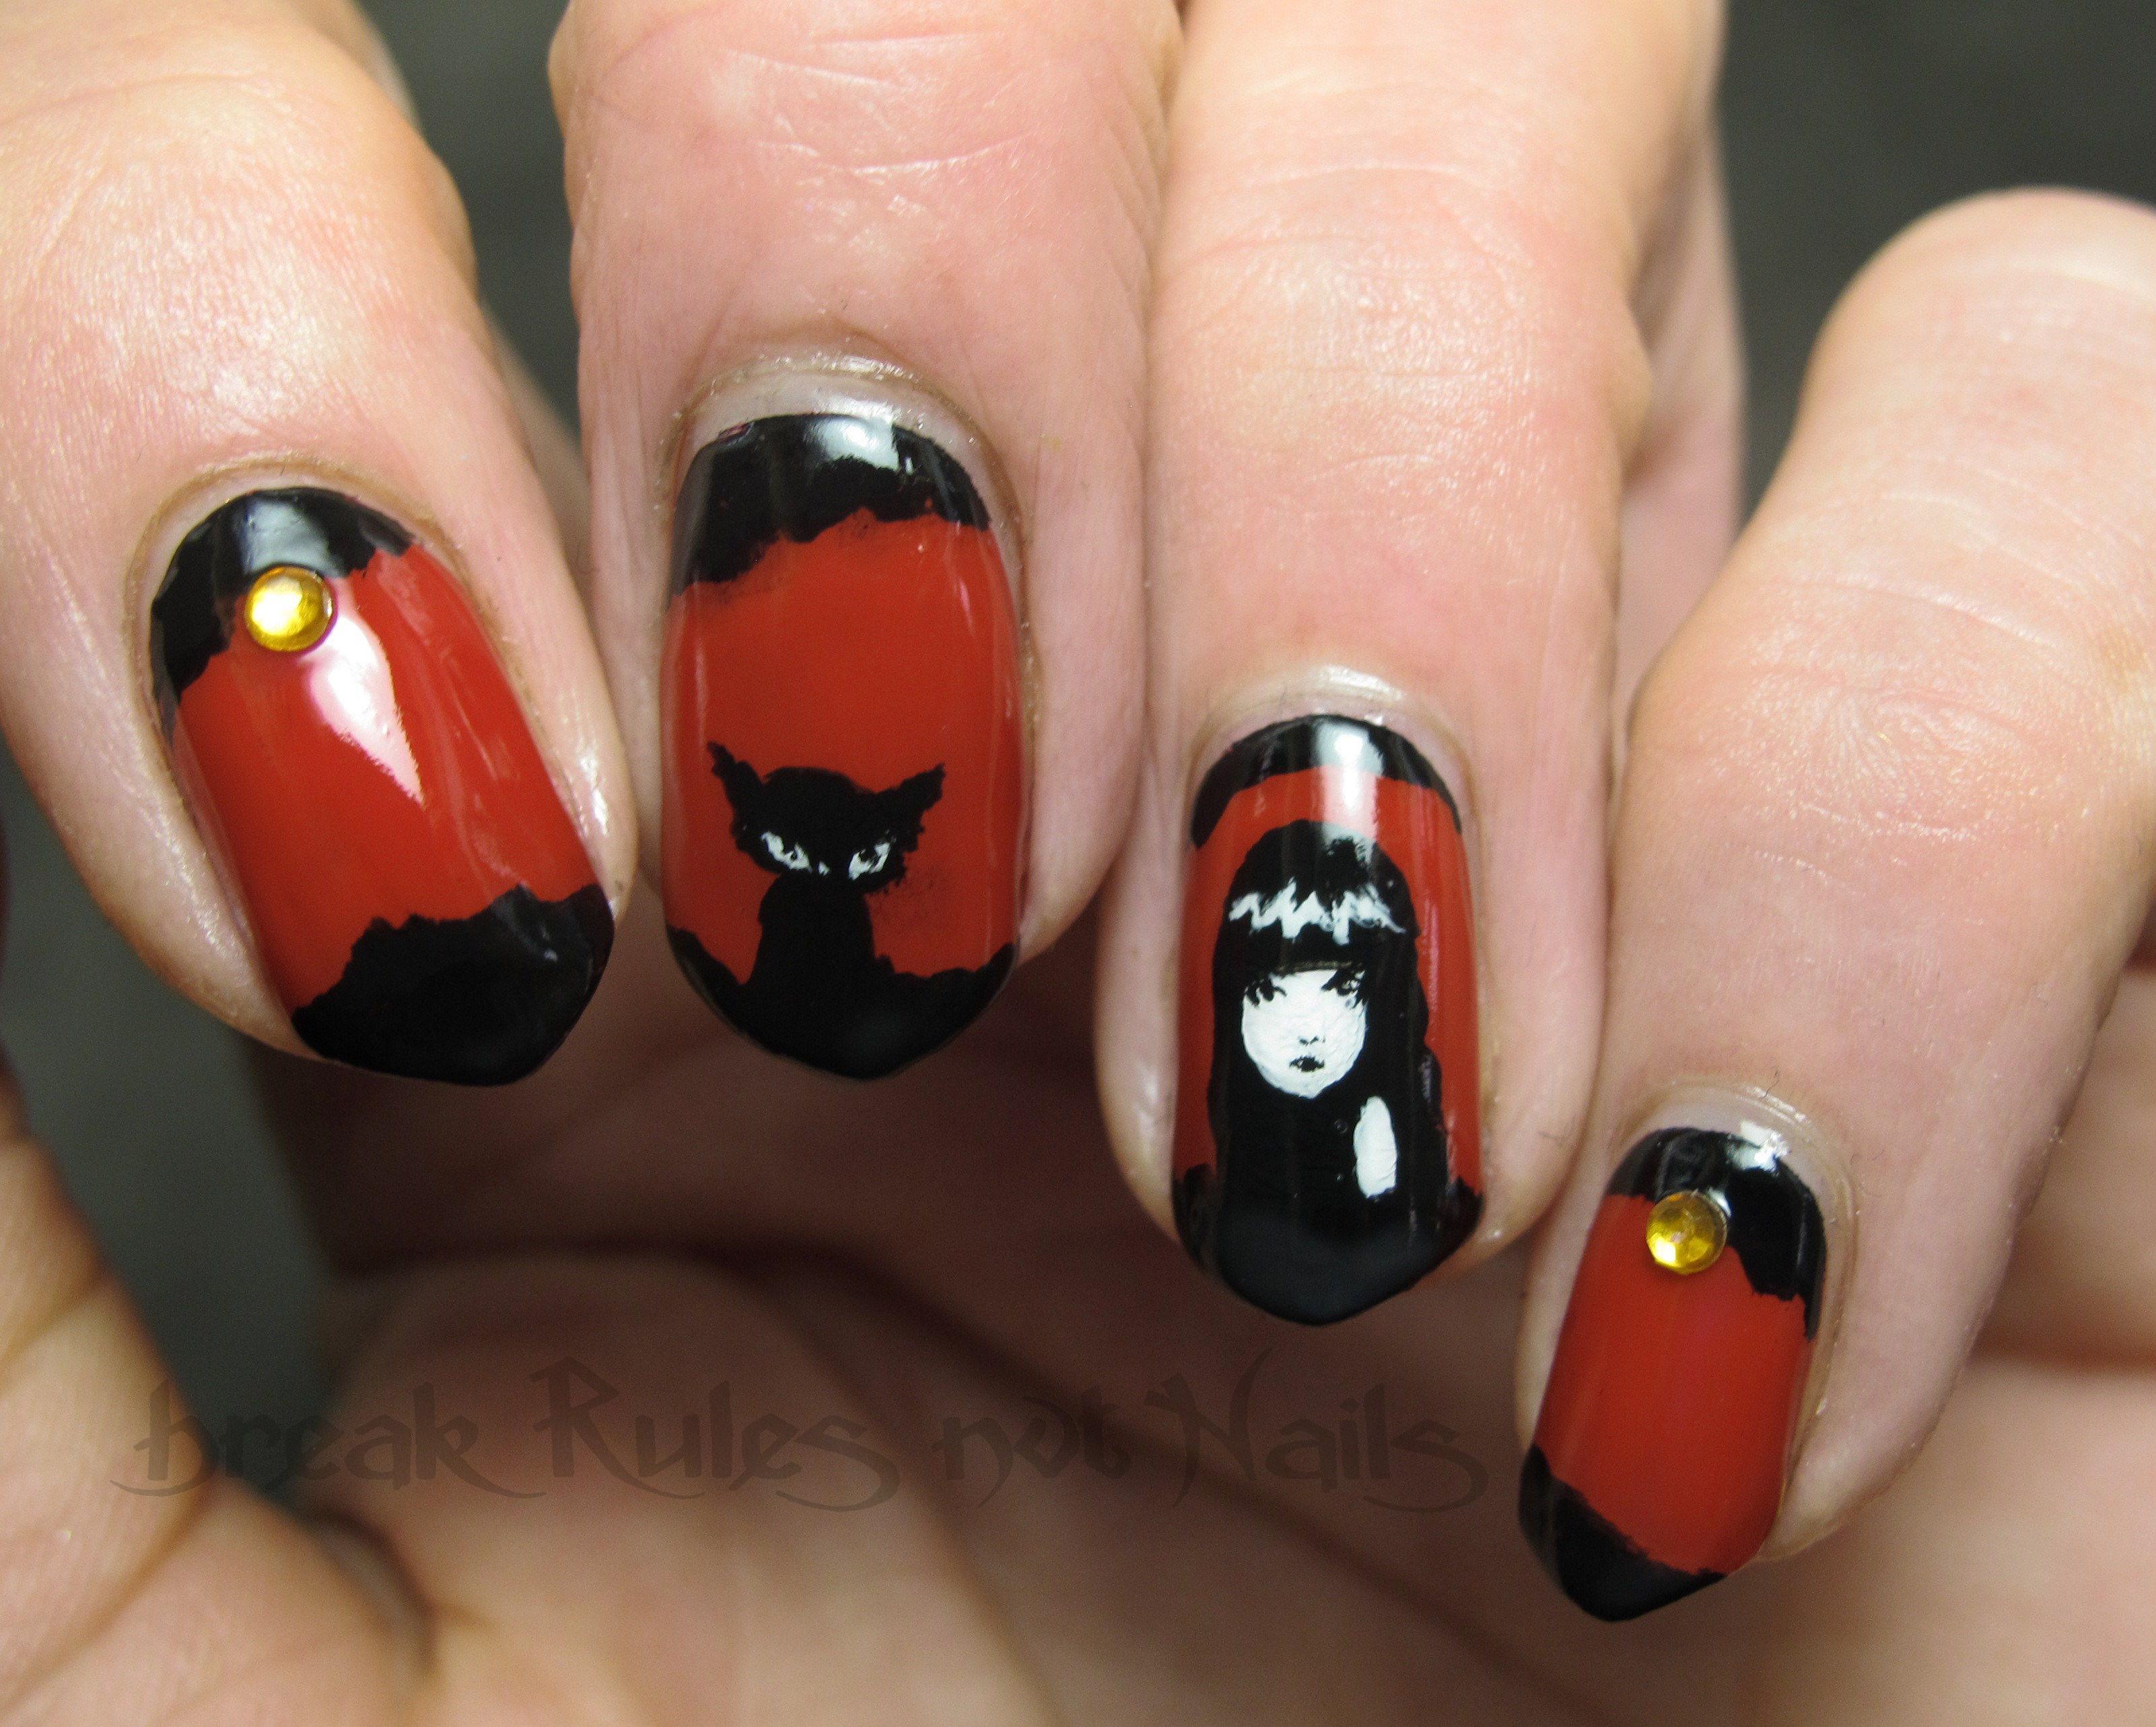 Glossy vs matte nail art | Break rules, not nails